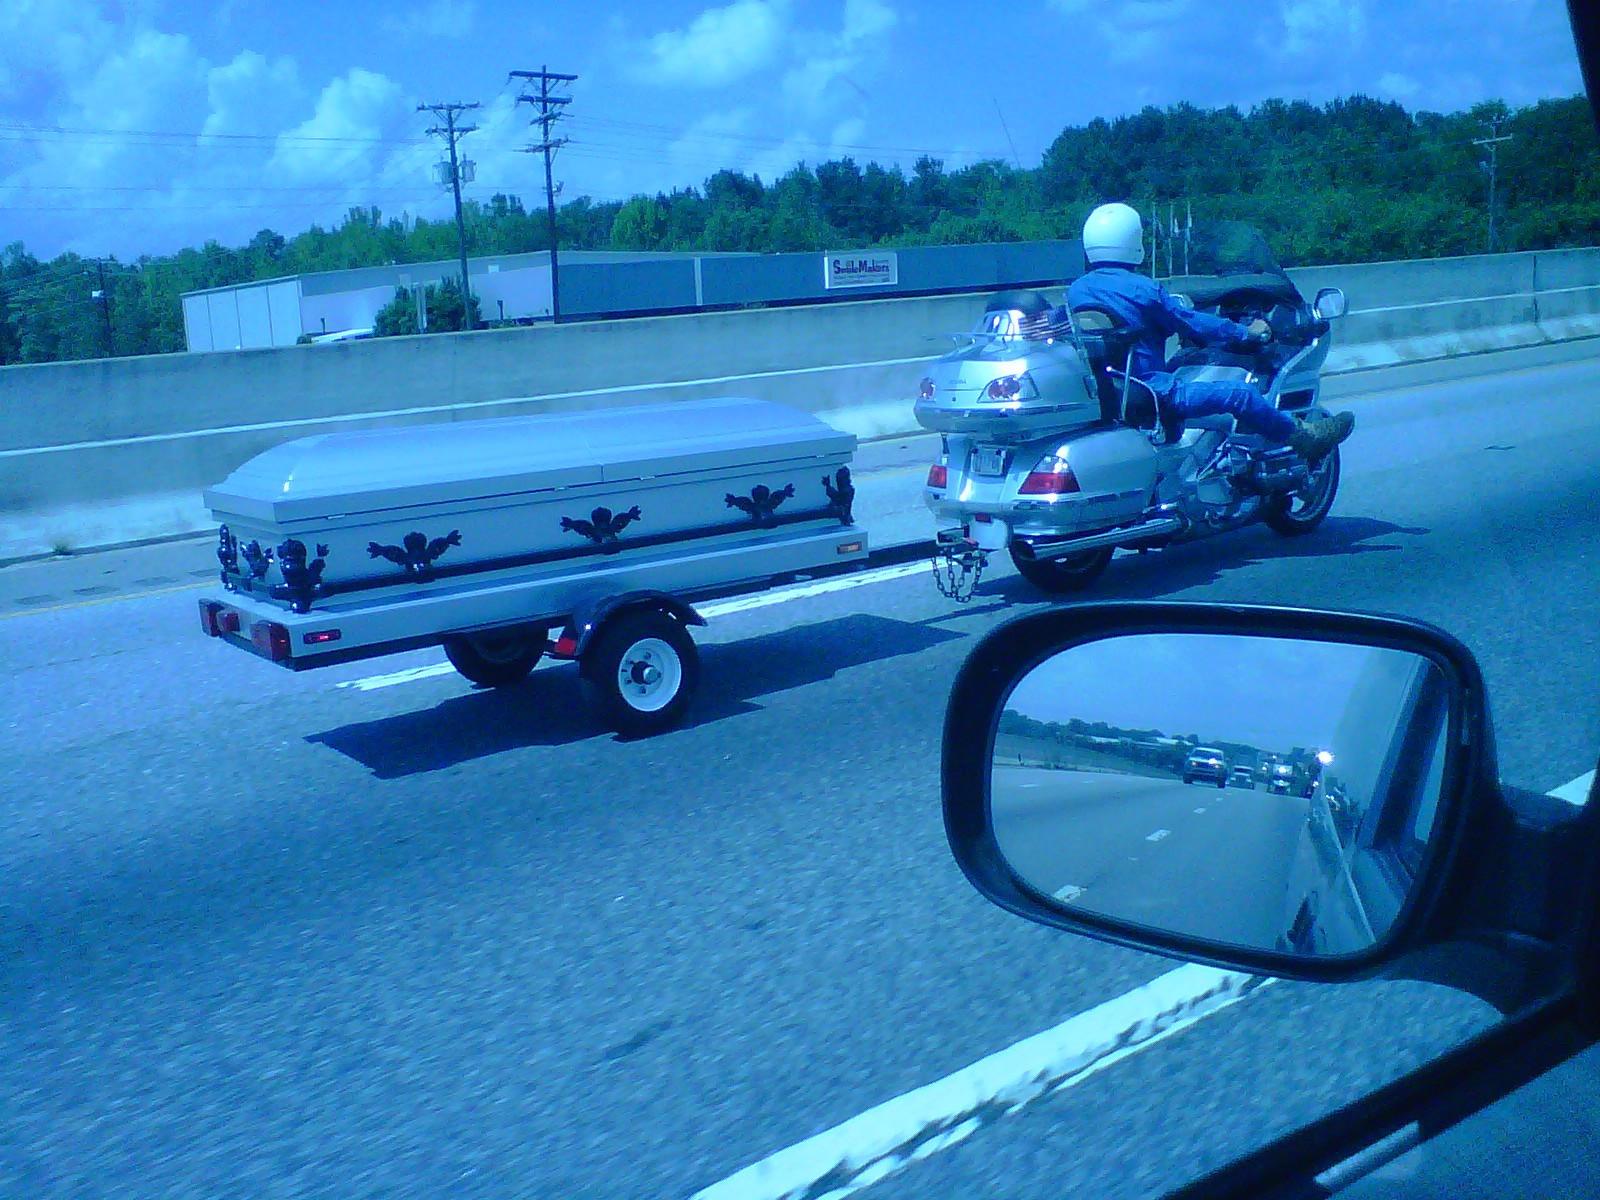 motos fúnebres